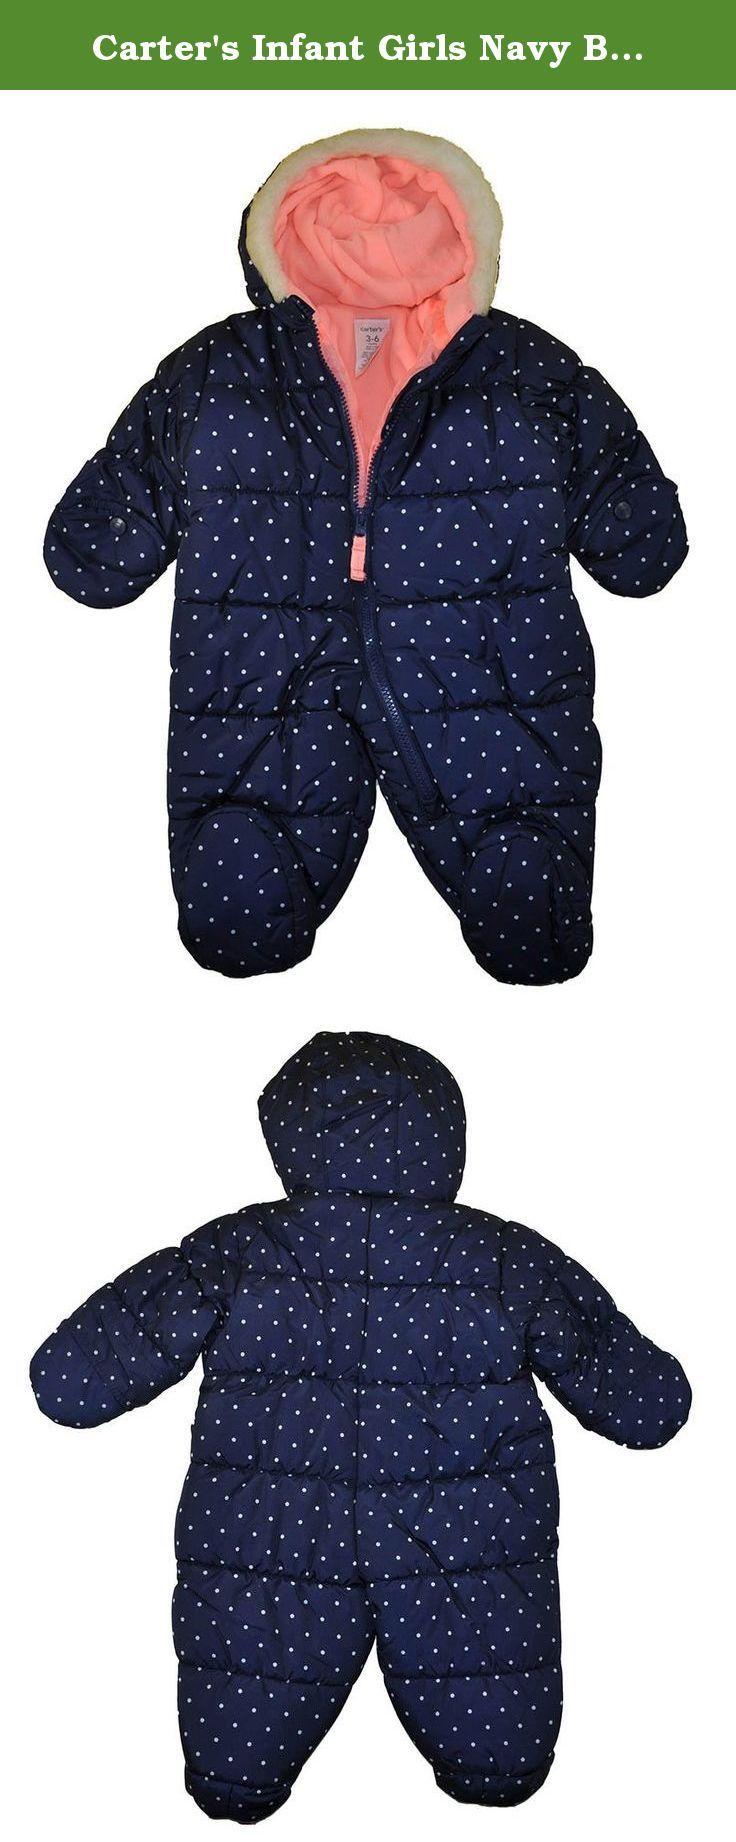 Carter's Infant Girls Navy Blue Polka Dot Pram (6/9M). Carter's infant girls pram with some fleece lining, zipper closure and polka dot print print. Faux fur hhod trim and hideaway mittens.